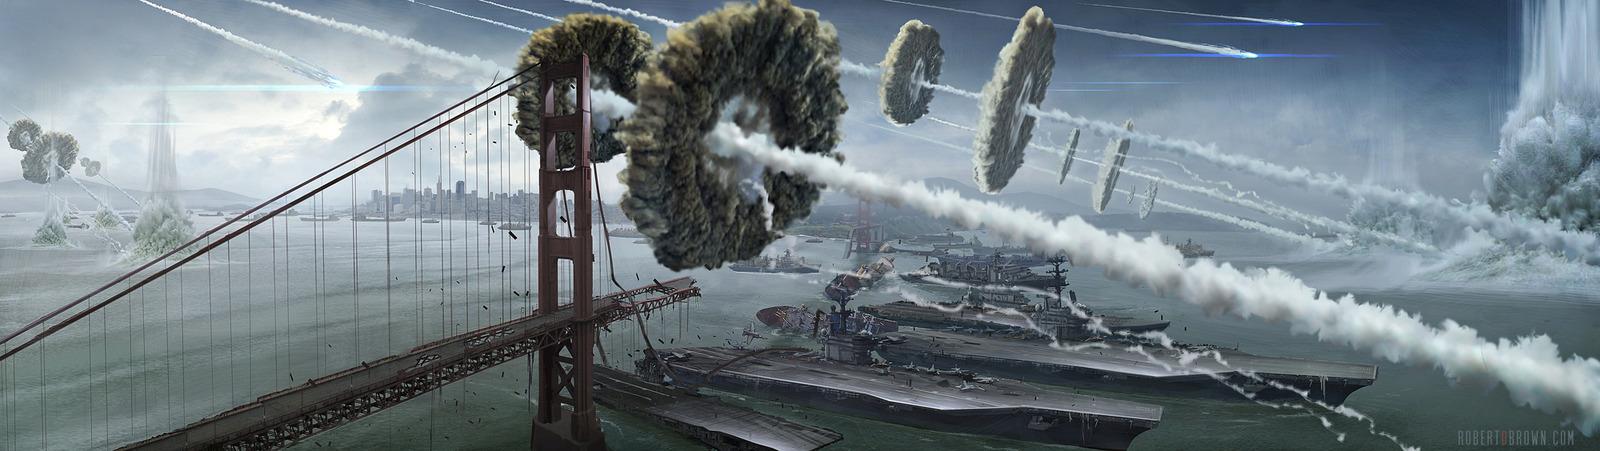 1600x451_5214_Battle_SF_2d_sci_fi_city_alien_invasion_conept_art_picture_image_digital_art